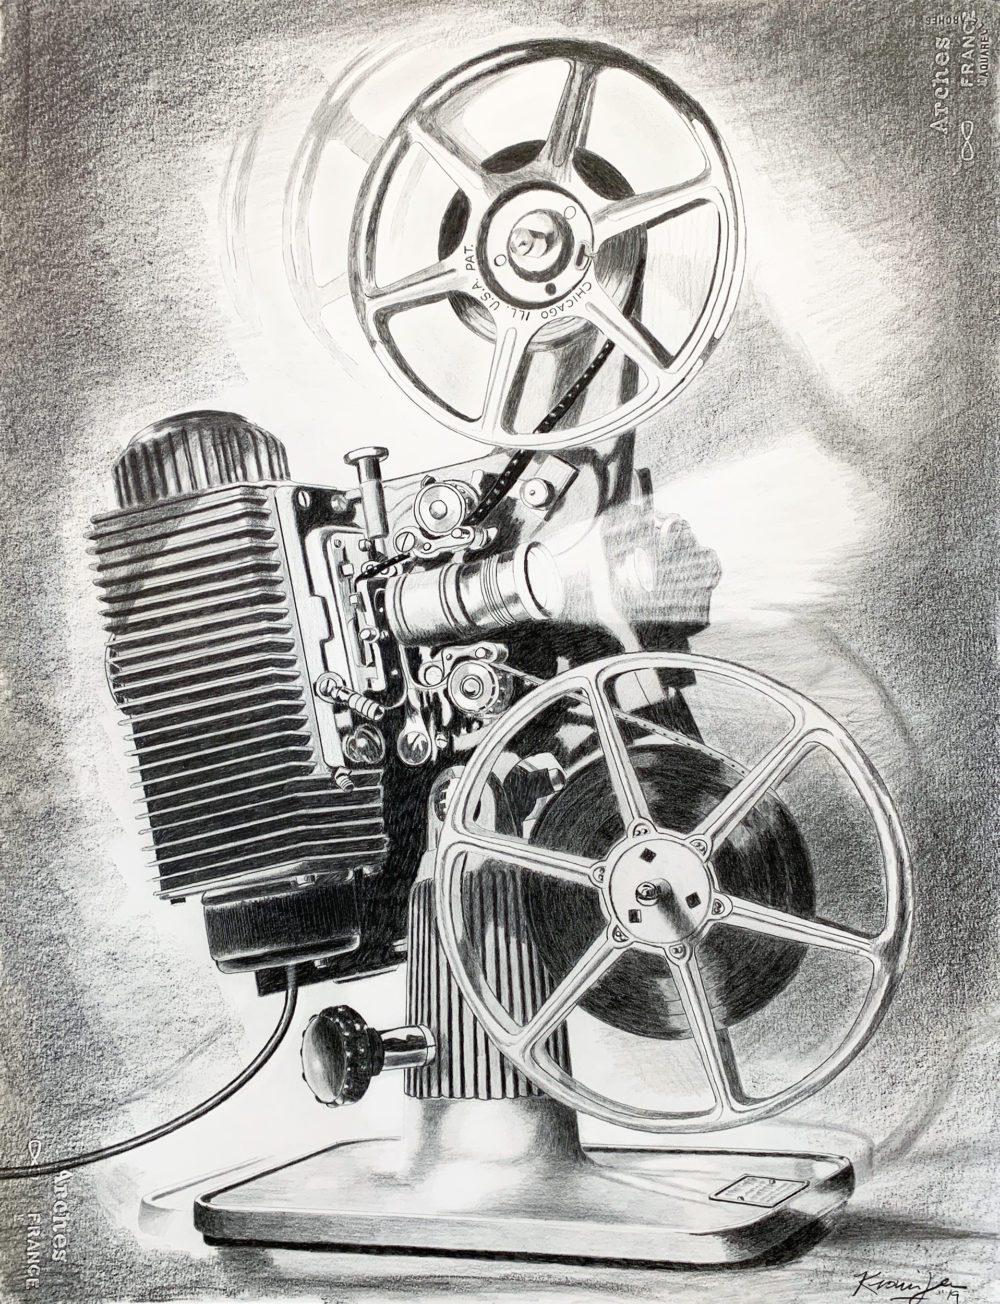 pencil drawing of analog object rick kroninger | Felder Gallery